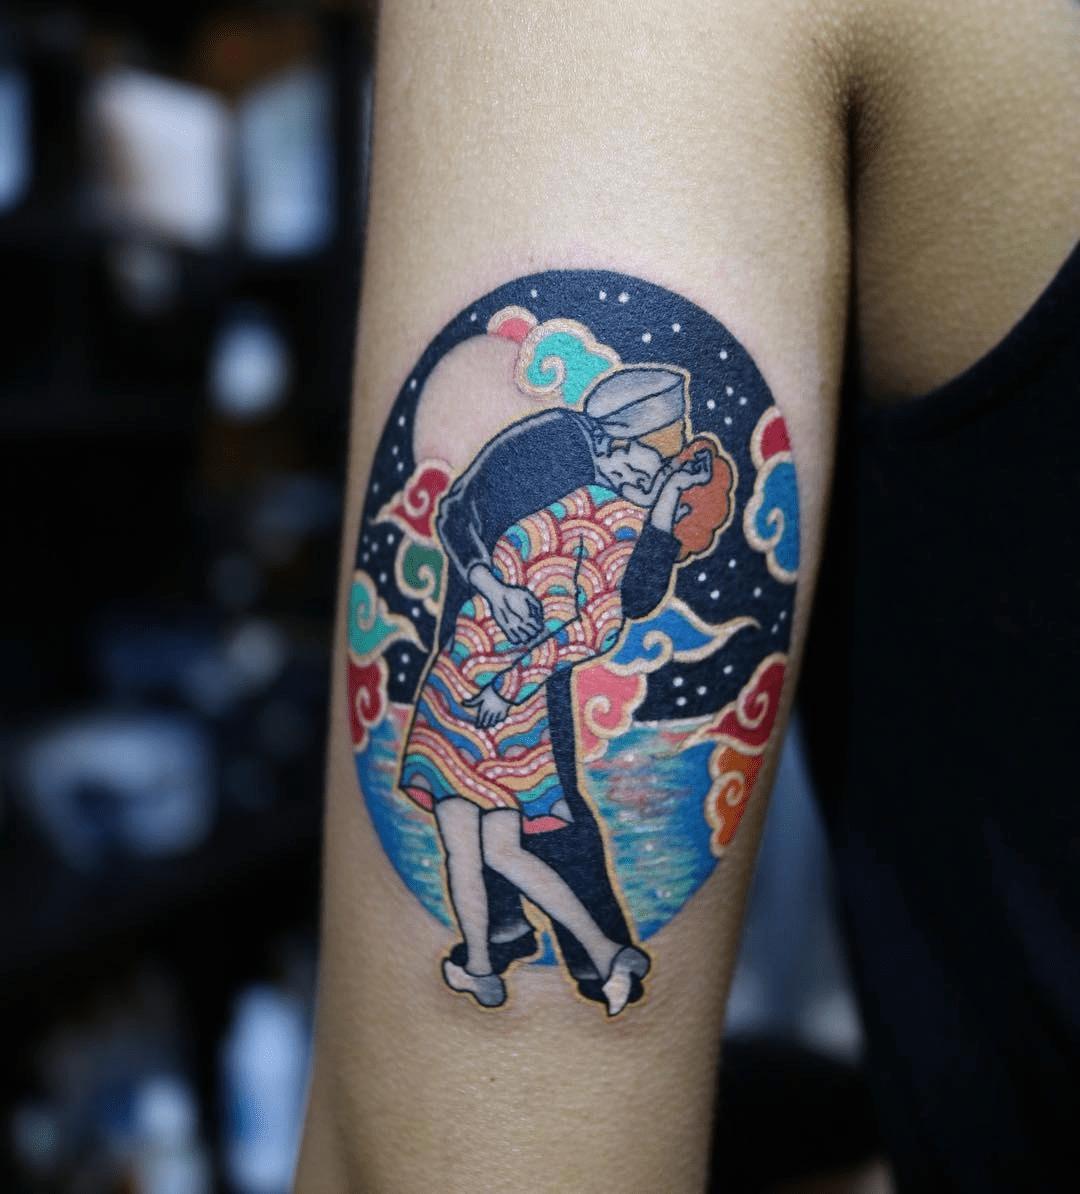 Korean Tattoo Style of the New York Kiss